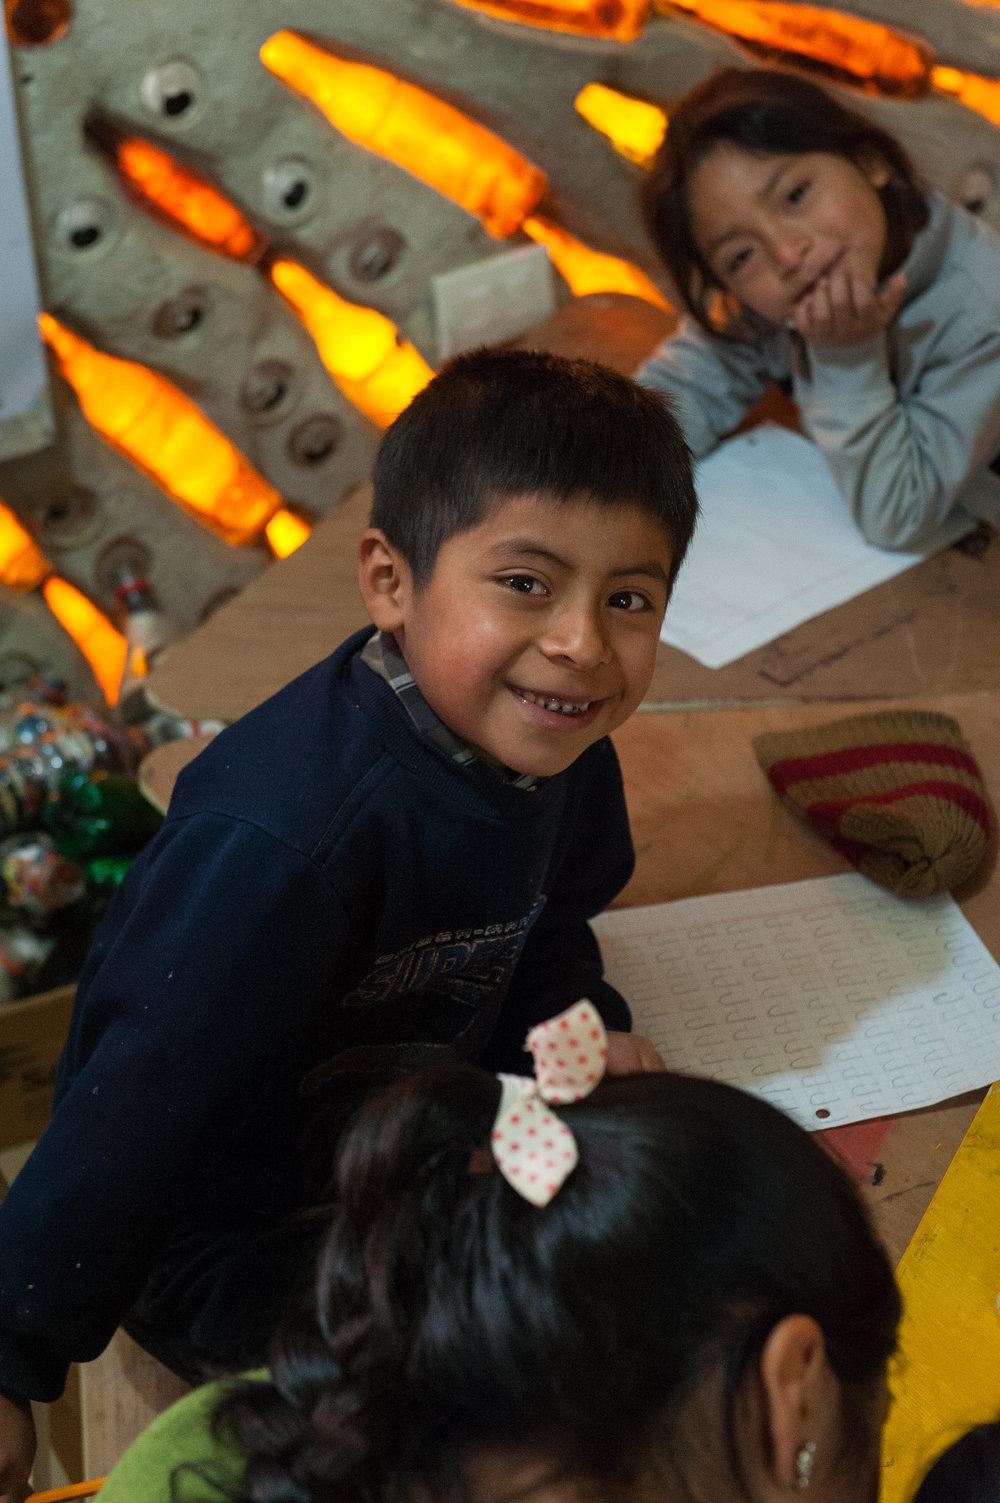 1540 LONG WAY HOME_2016_Guatemala_photographers without borders_ronbwilson_160302_312.jpg